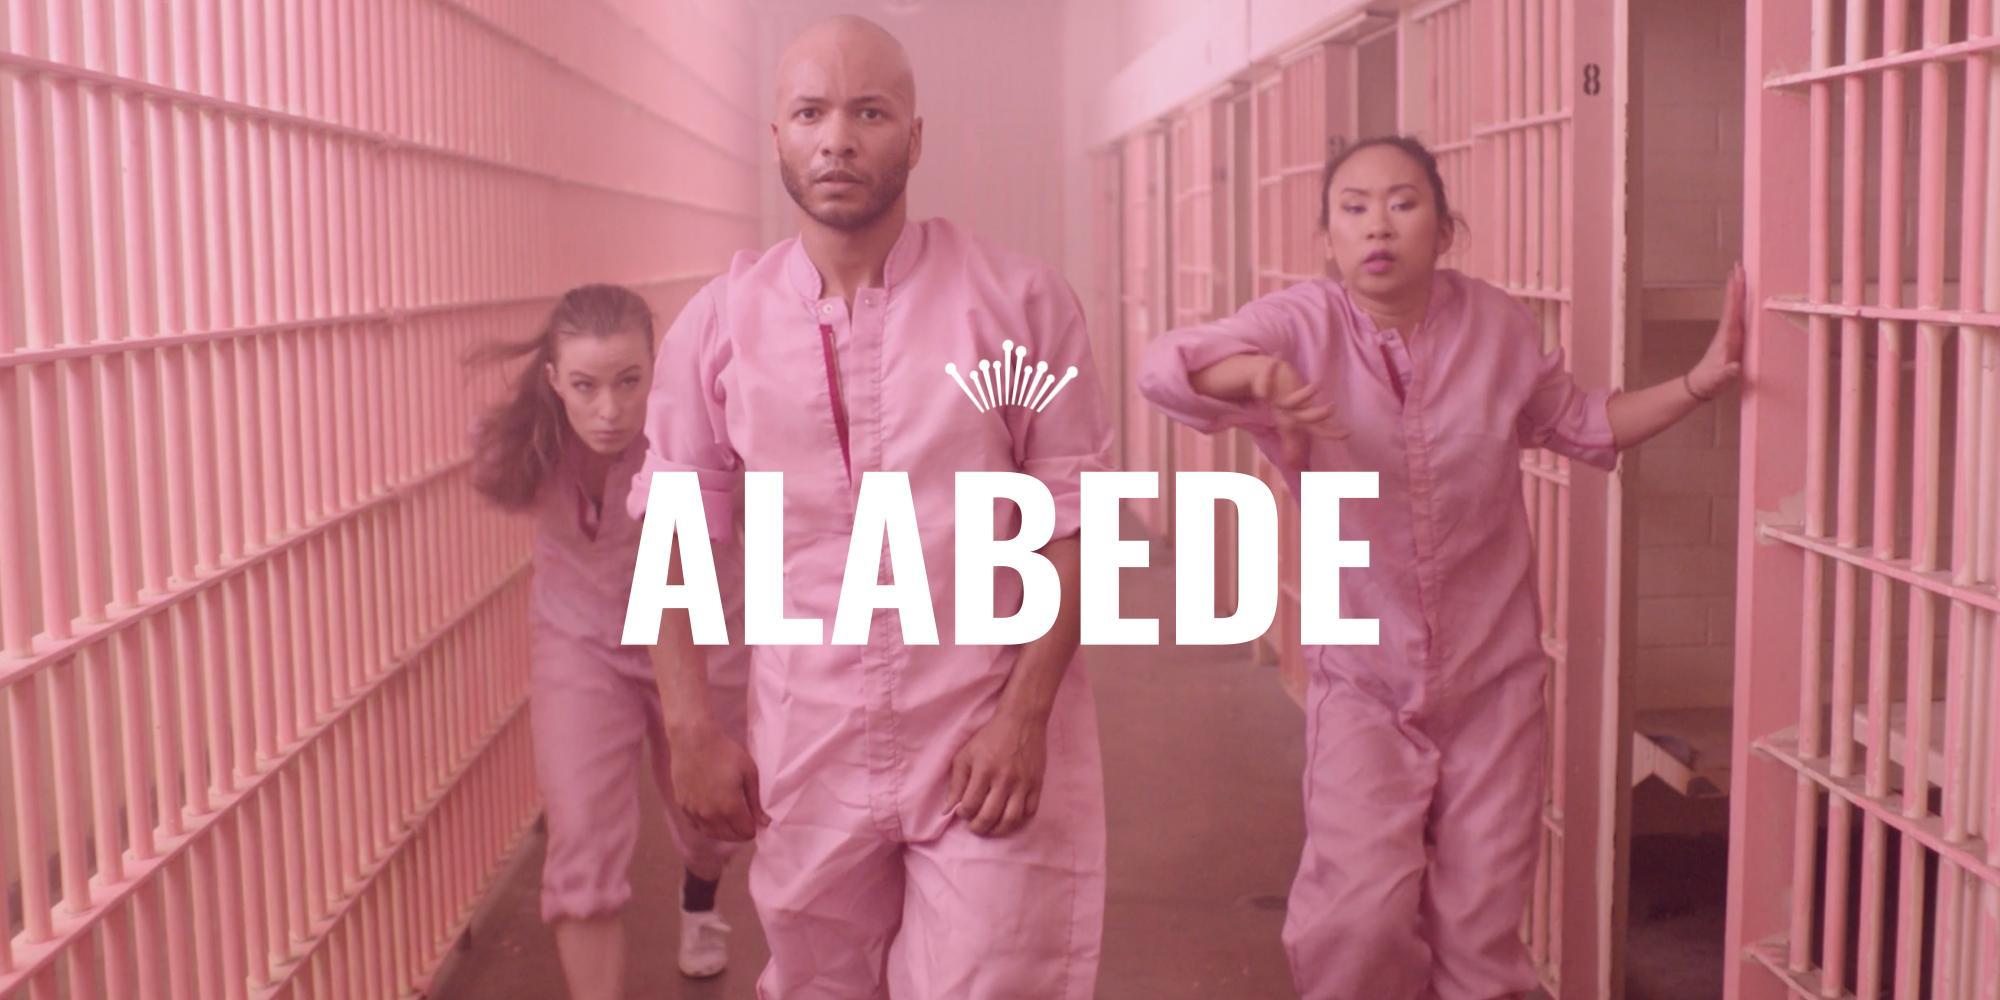 ALABEDE